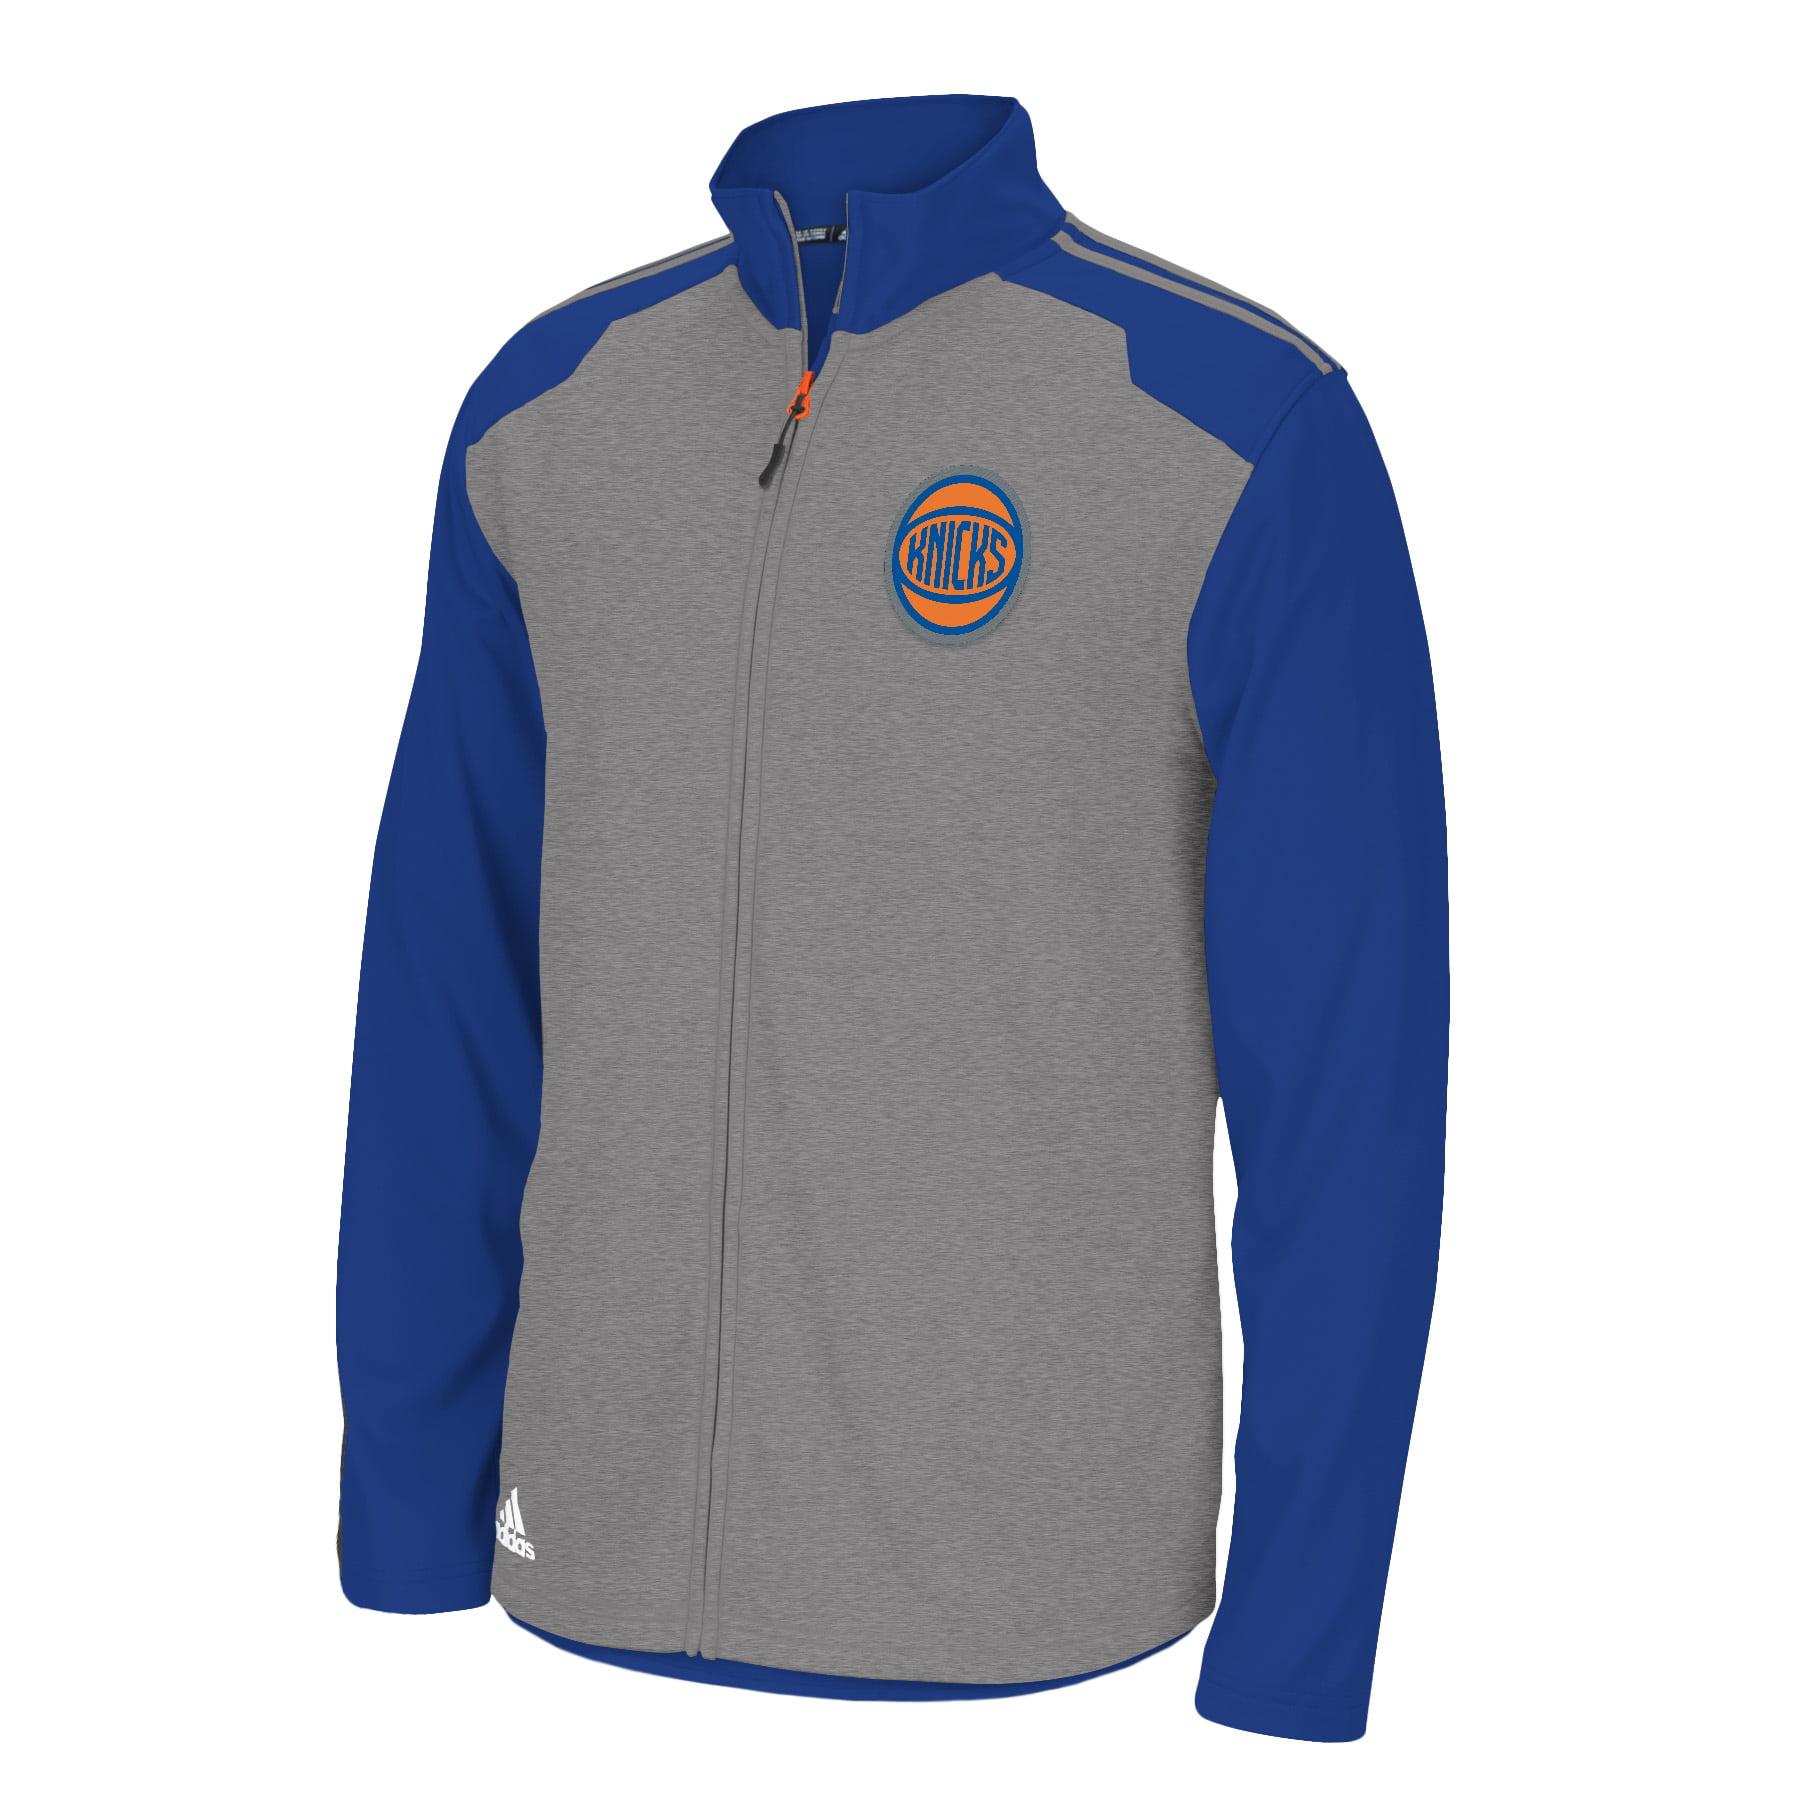 New York Knicks Adidas 2014 NBA Climawarm Full Zip Men's Fleece Jacket by Adidas